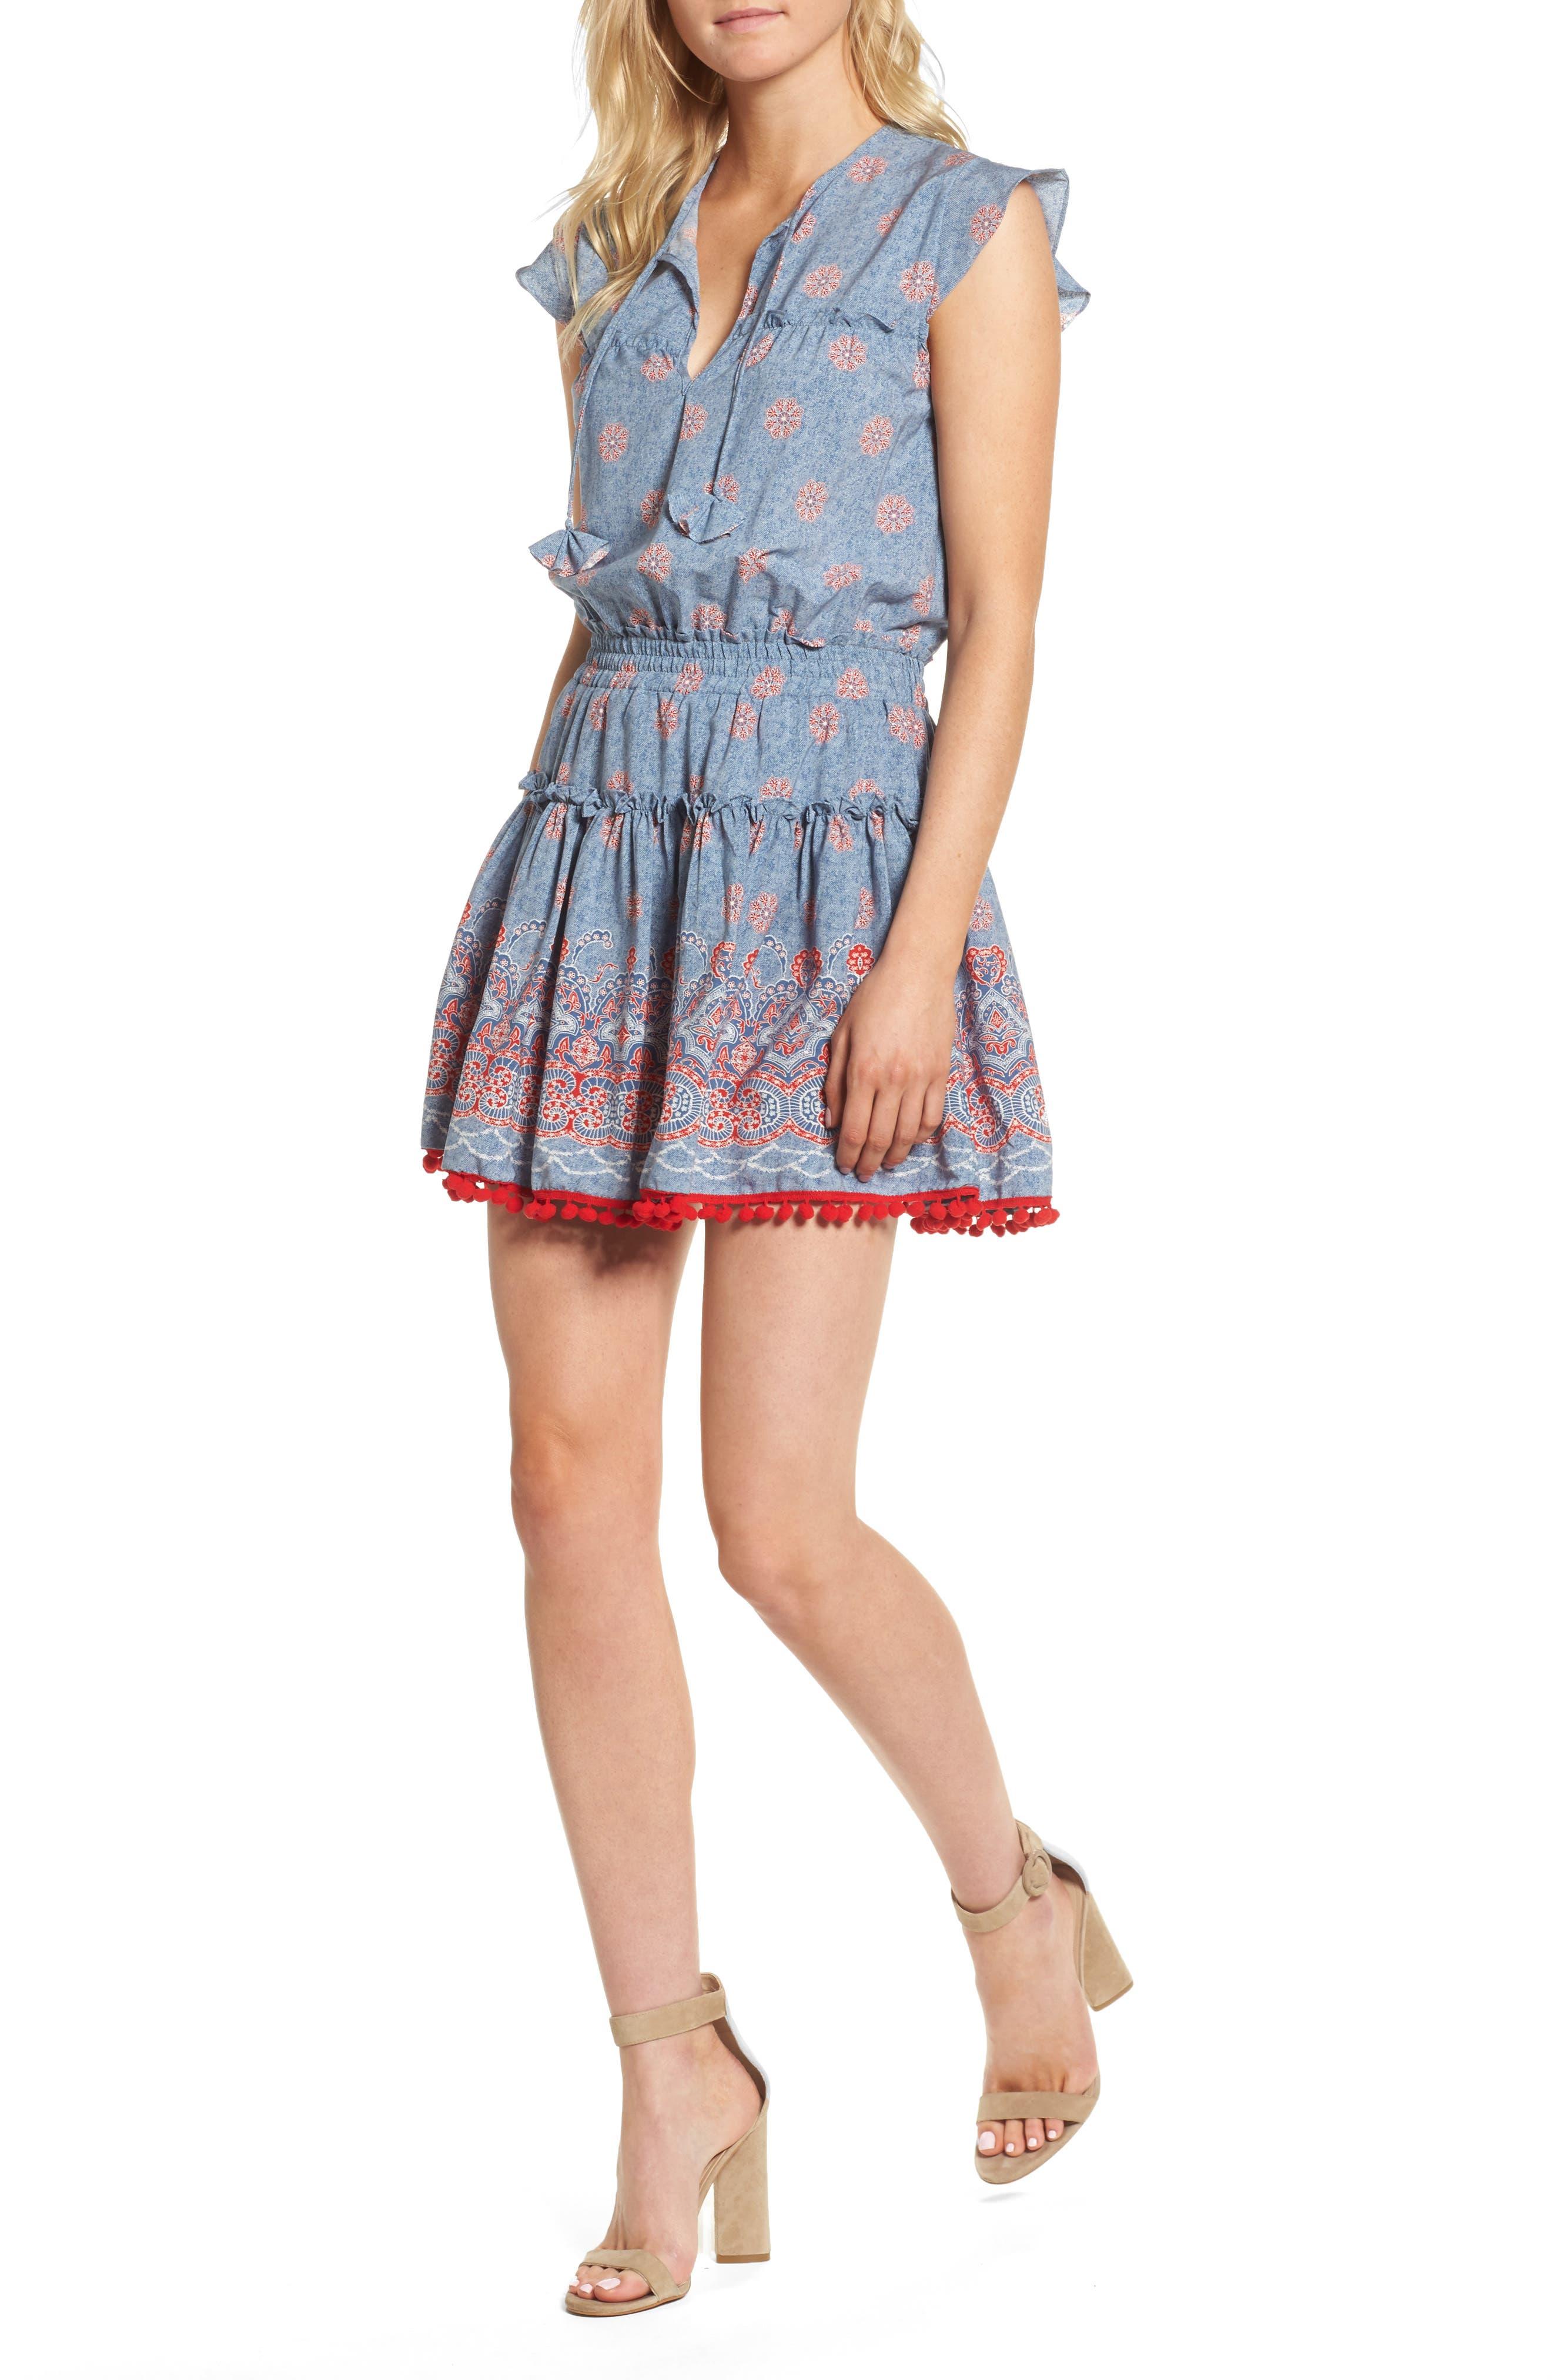 Tatiana Minidress,                         Main,                         color, Blue/ Red Multi